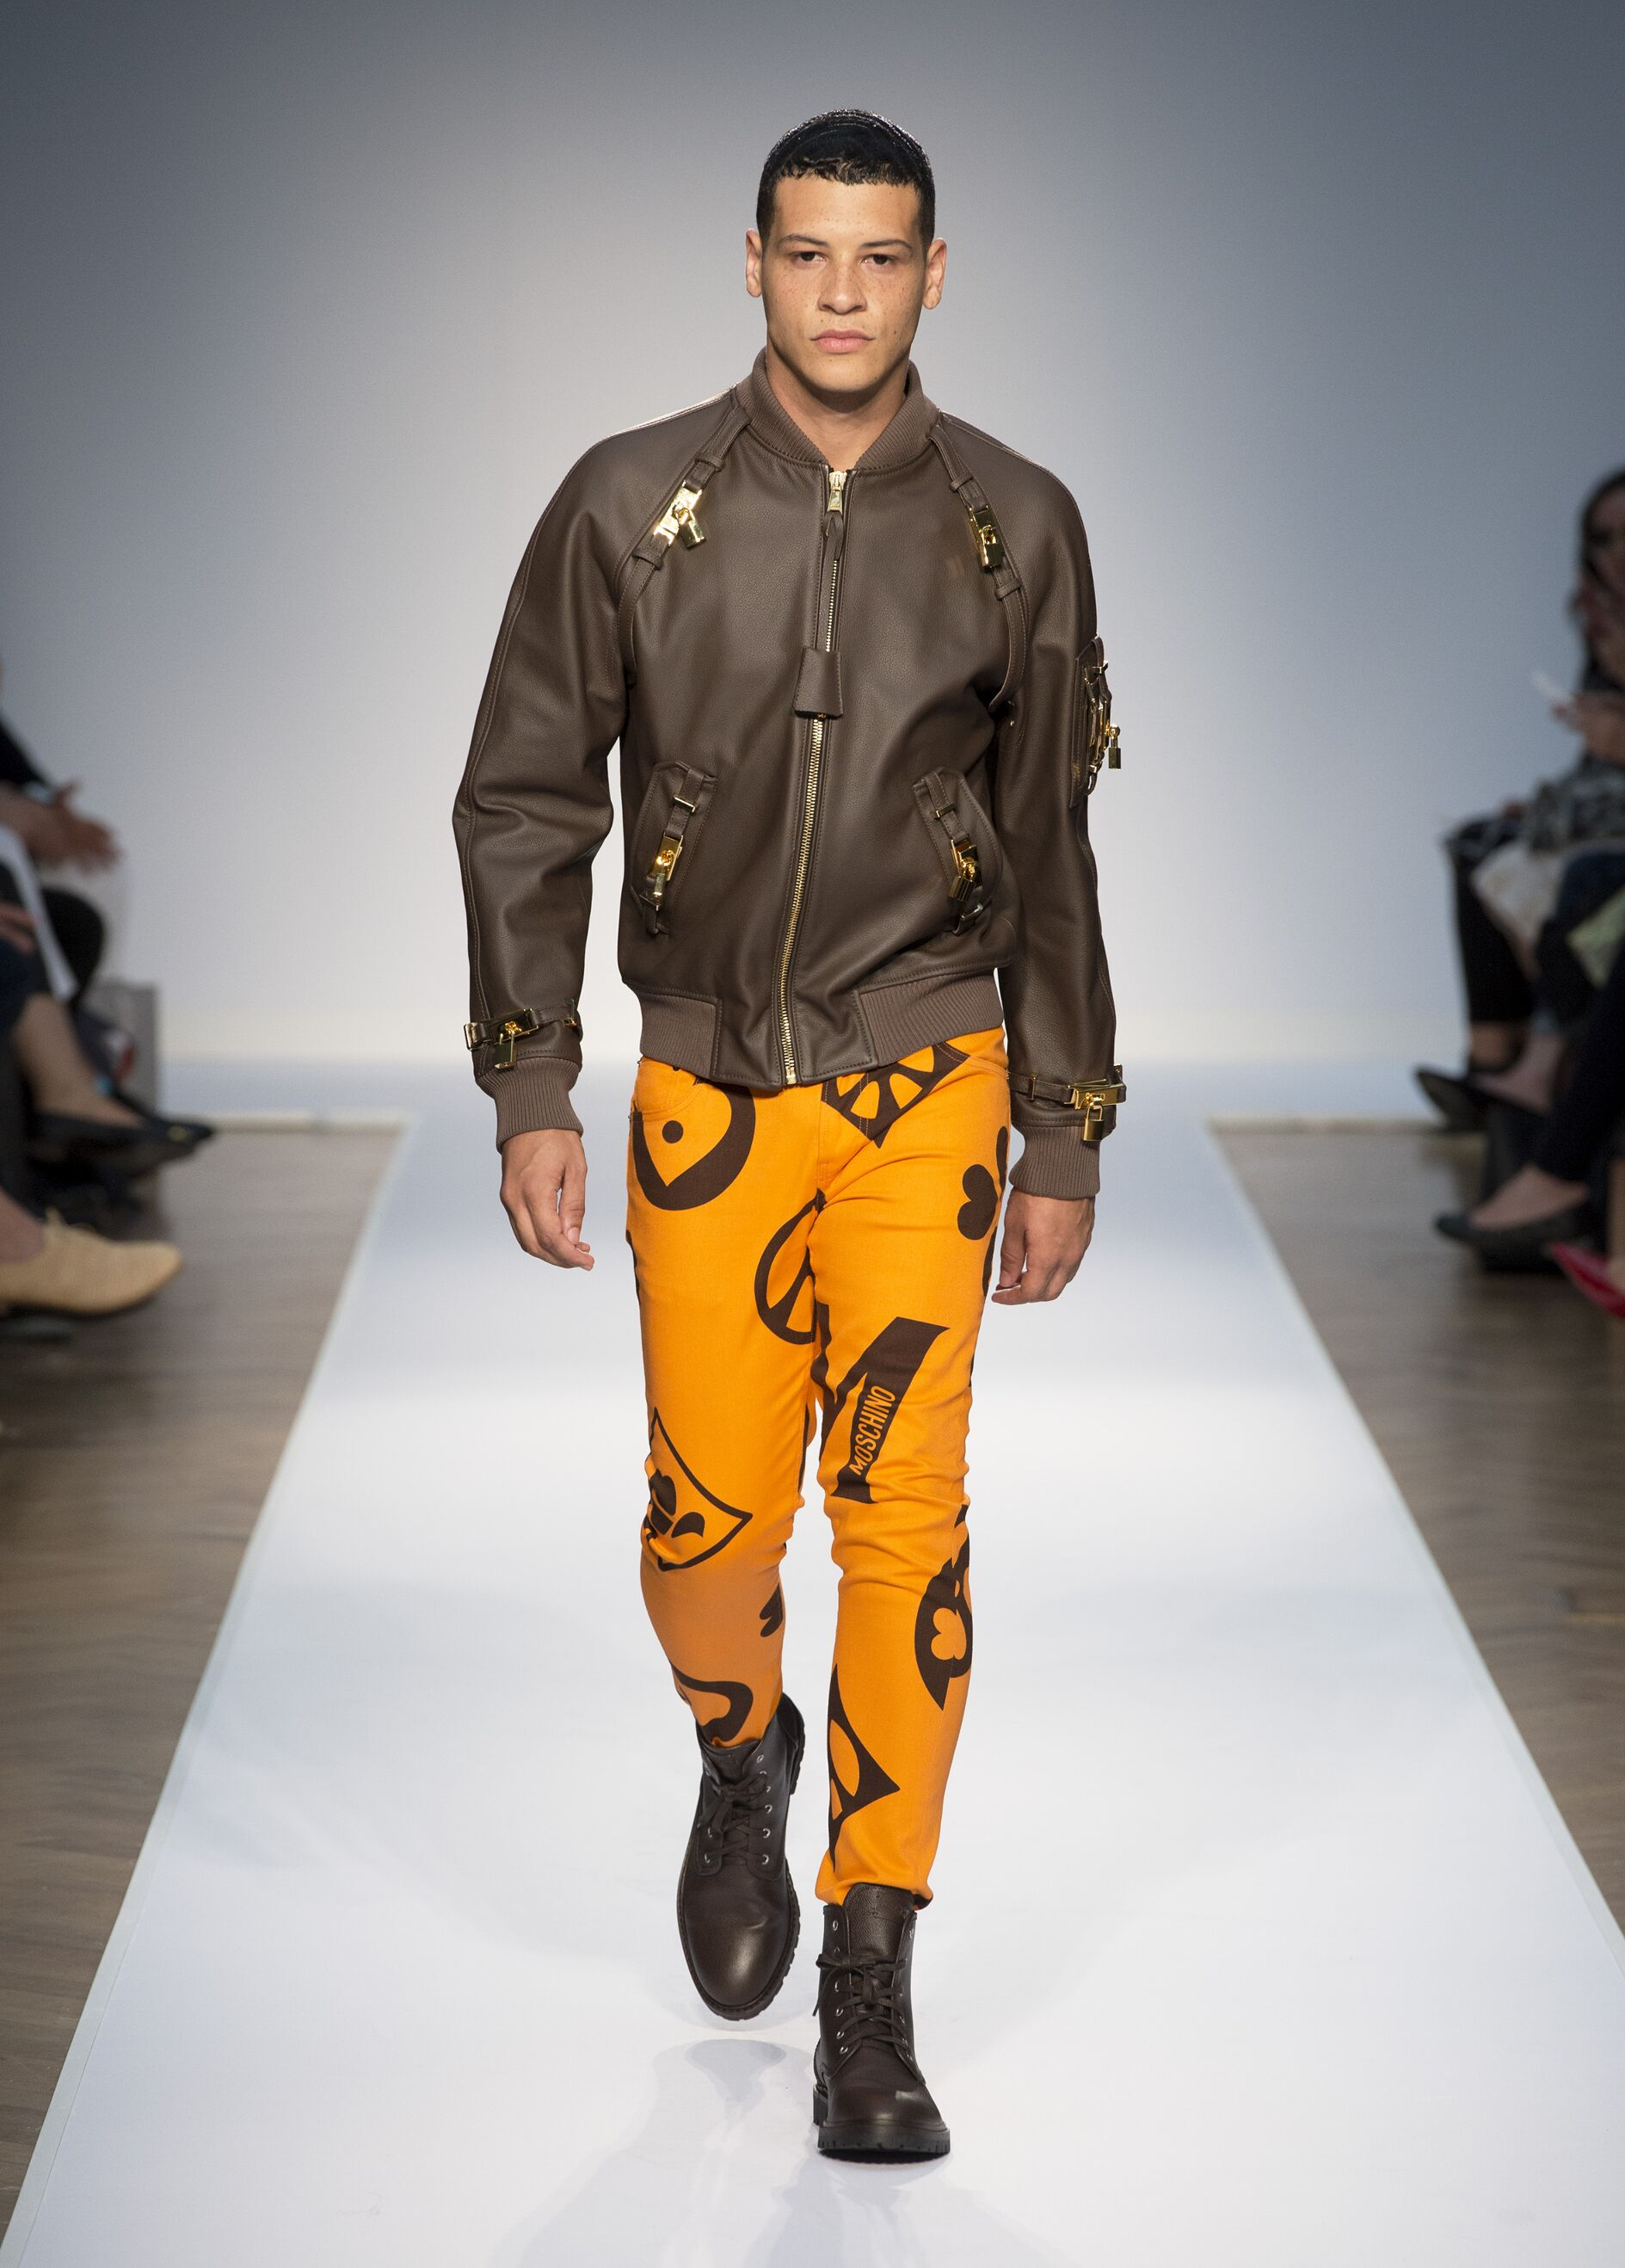 2015 Catwalk Moschino Man Fashion Show Summer